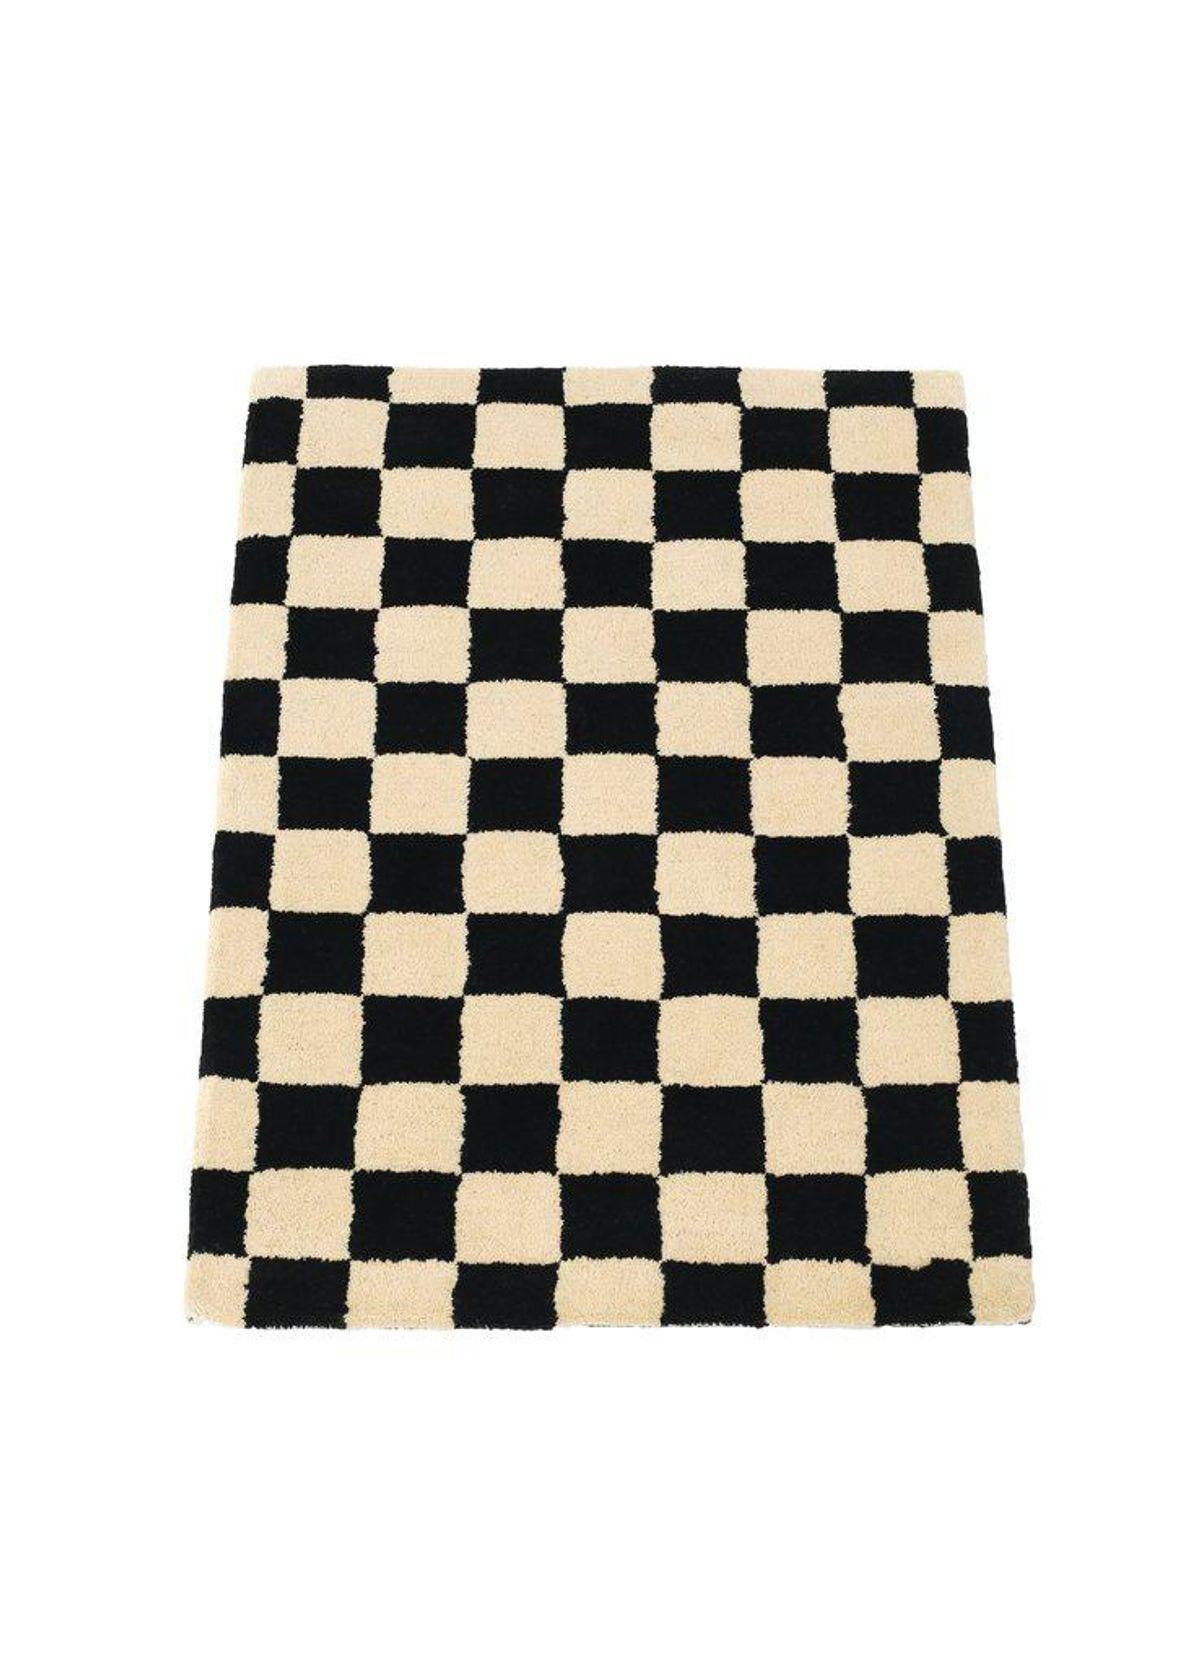 Black and Cream Mat 2' x 3'